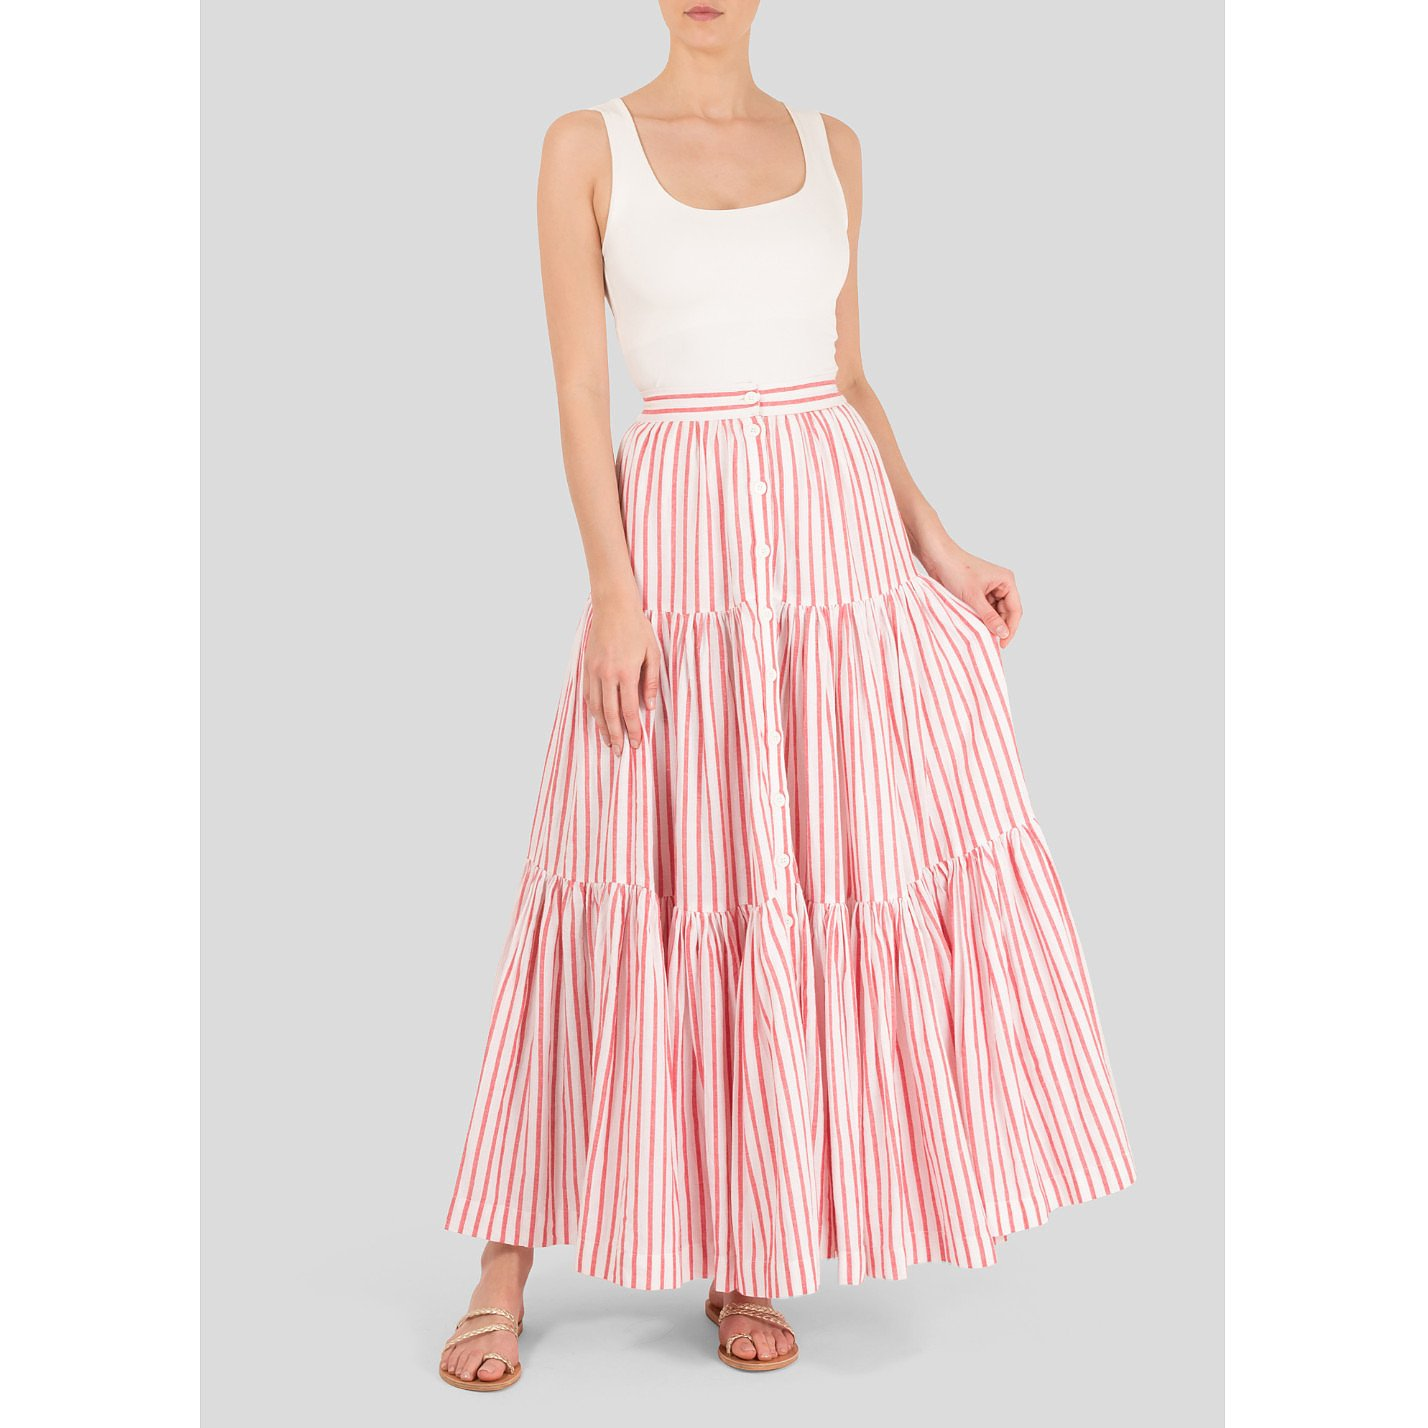 Wiggy Kit Striped Tiered Maxi Skirt